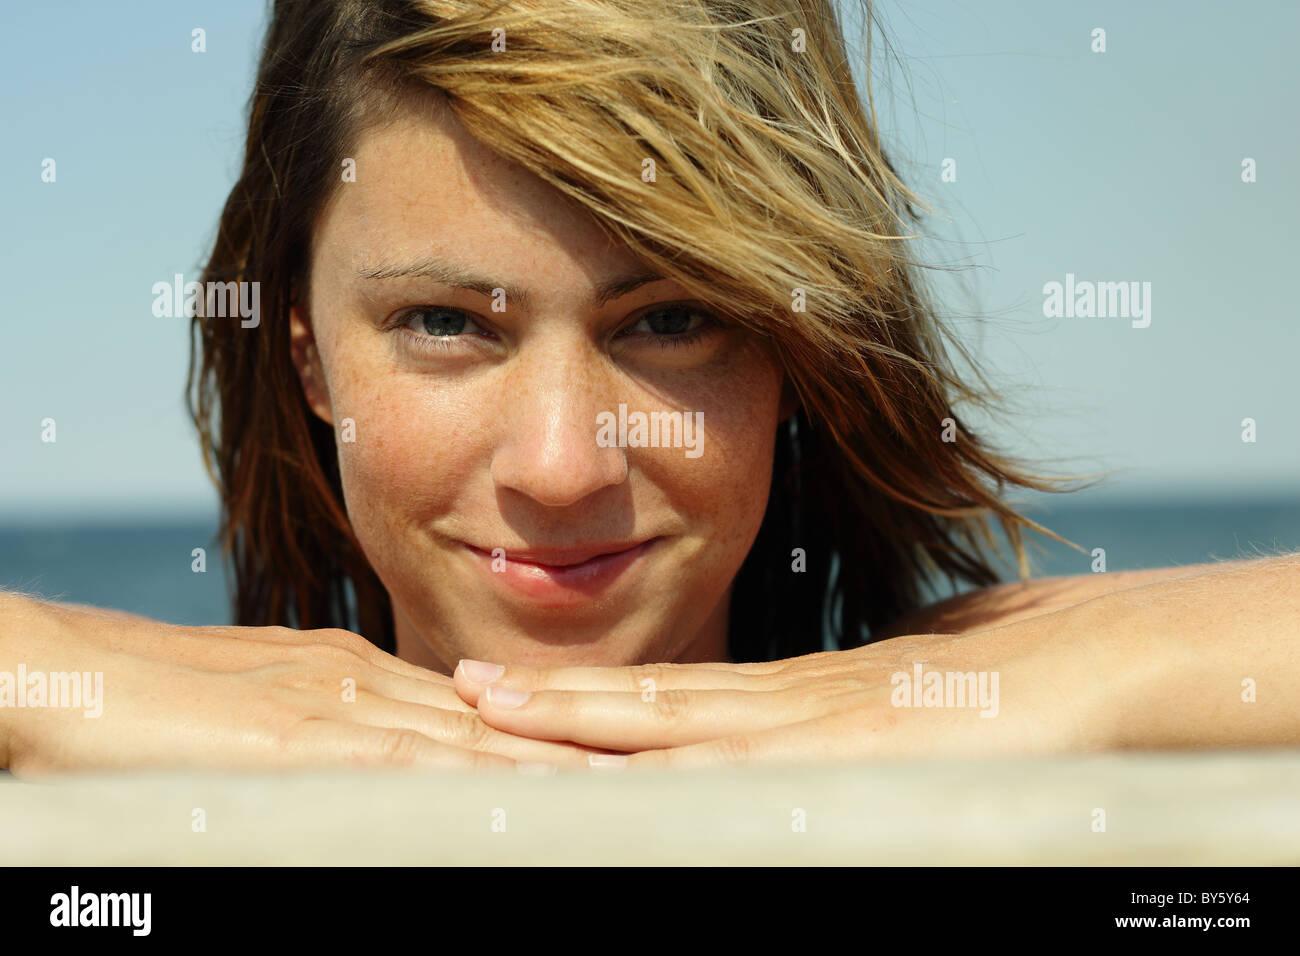 summer dream - Stock Image